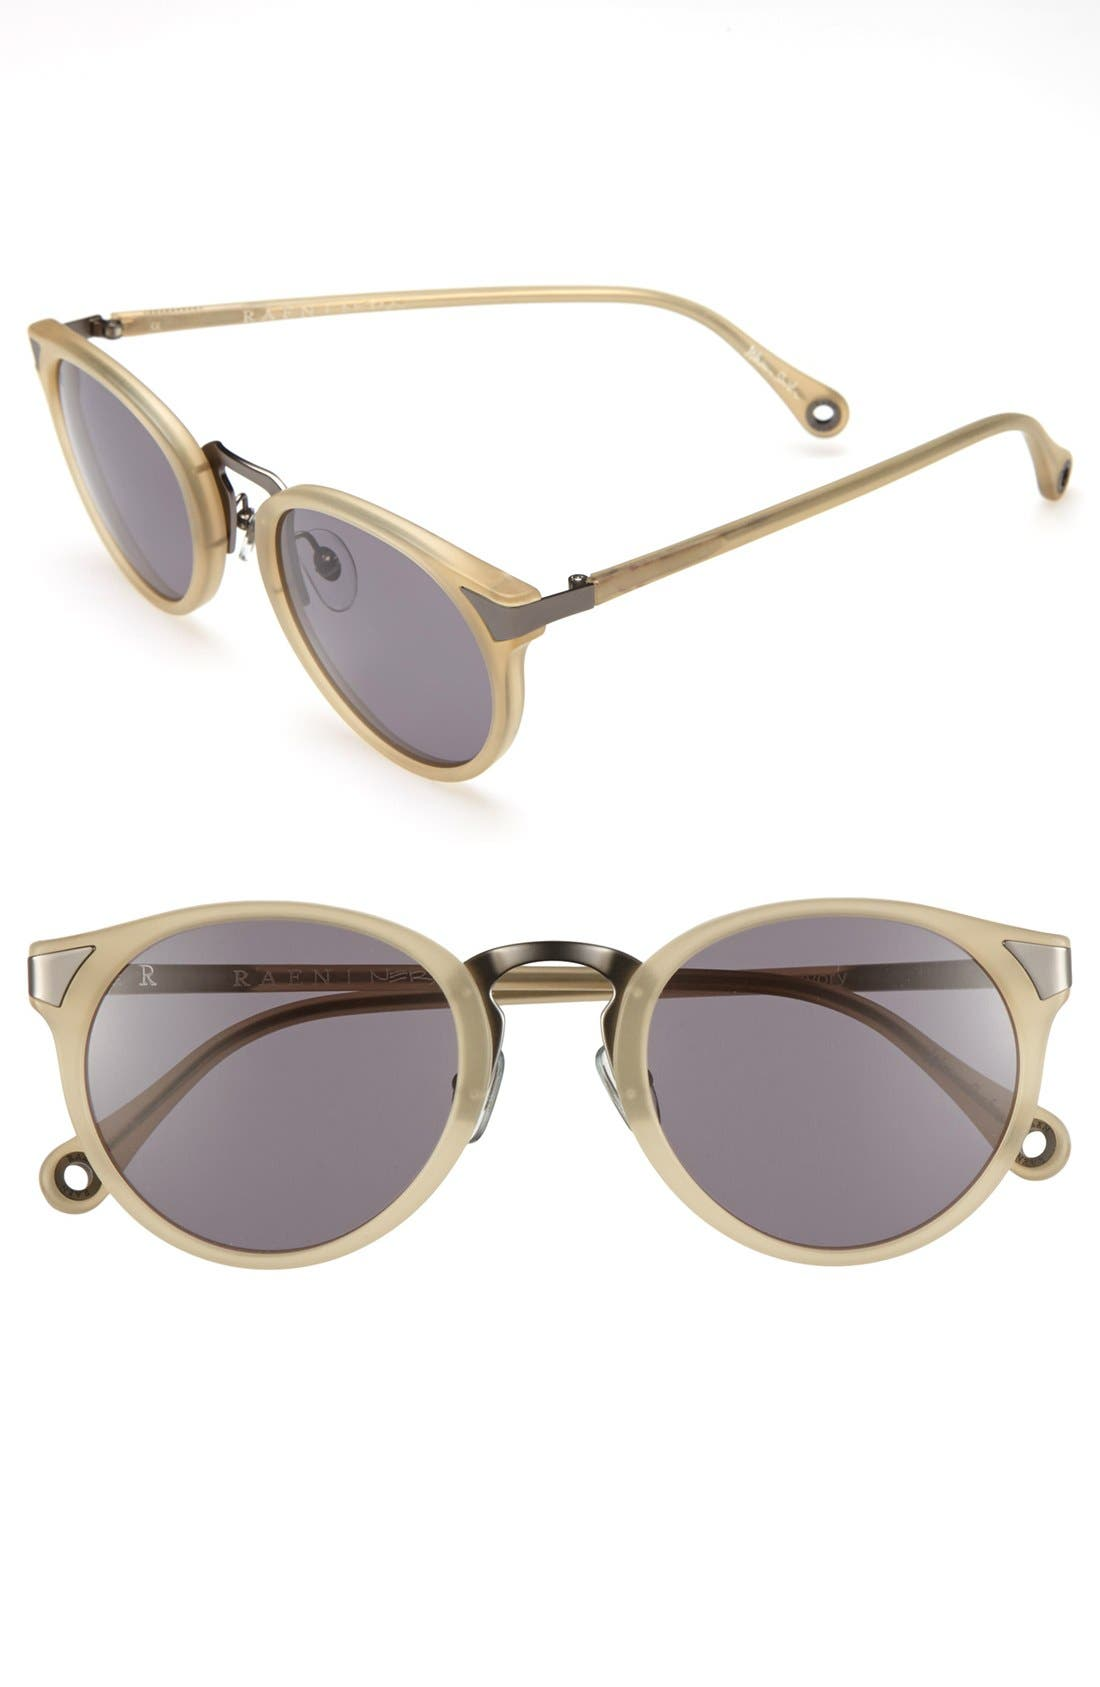 Alternate Image 1 Selected - RAEN 'Nera' 50mm Sunglasses (Online Exclusive)